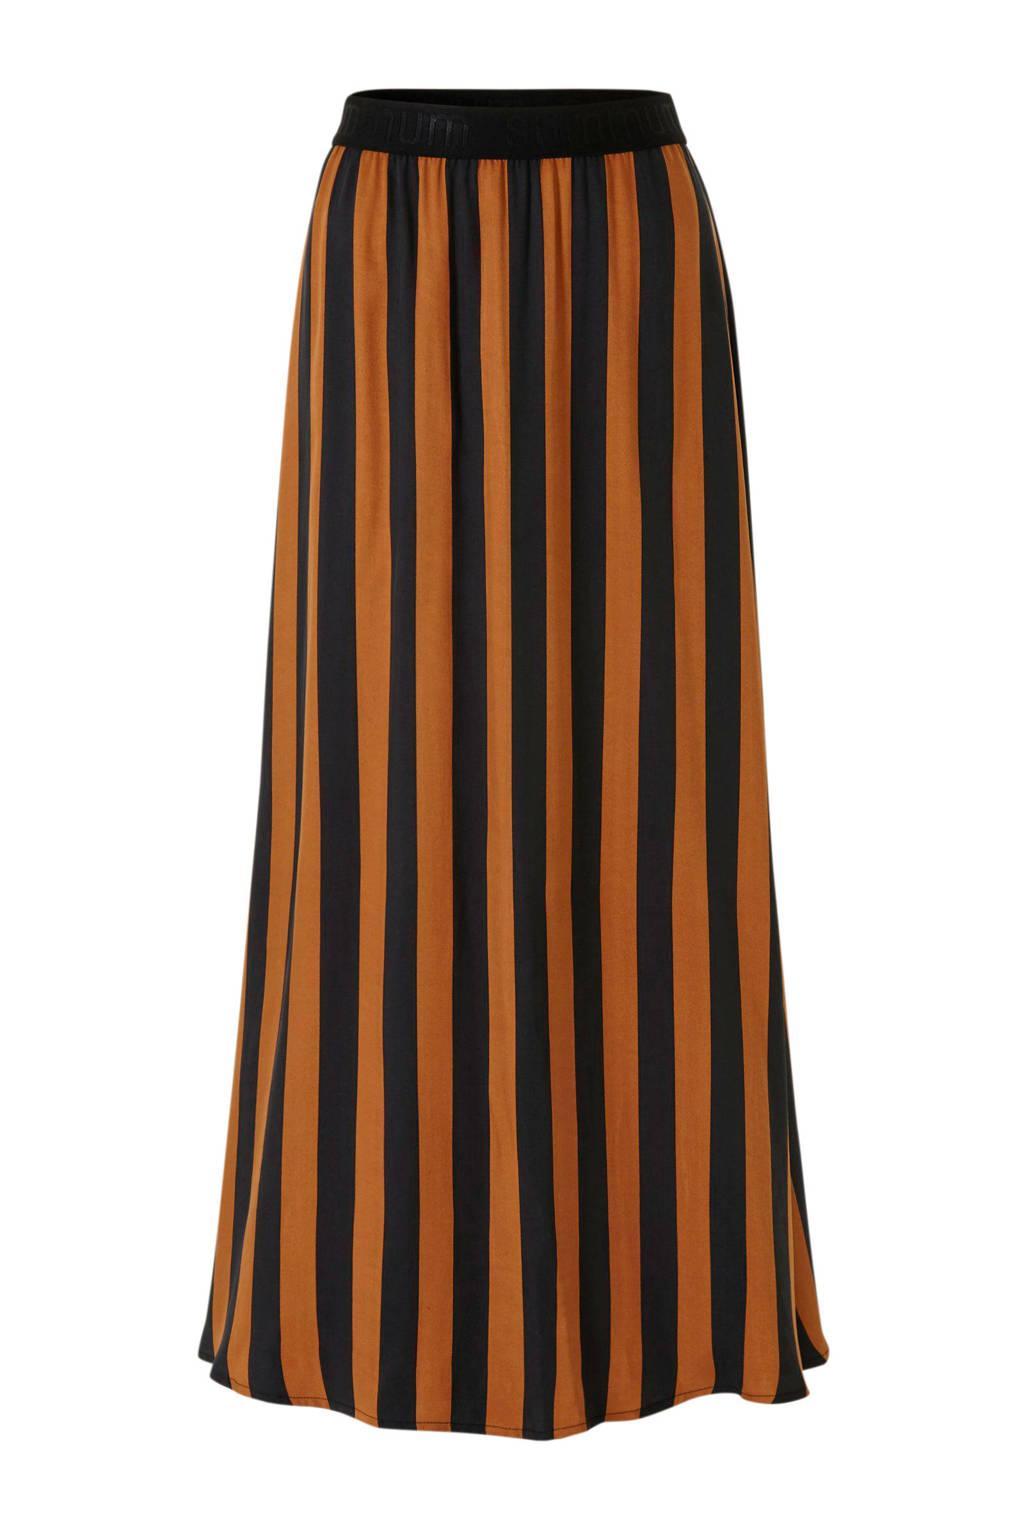 Summum Woman gestreepte rok zwart/oranje, Zwart/oranje